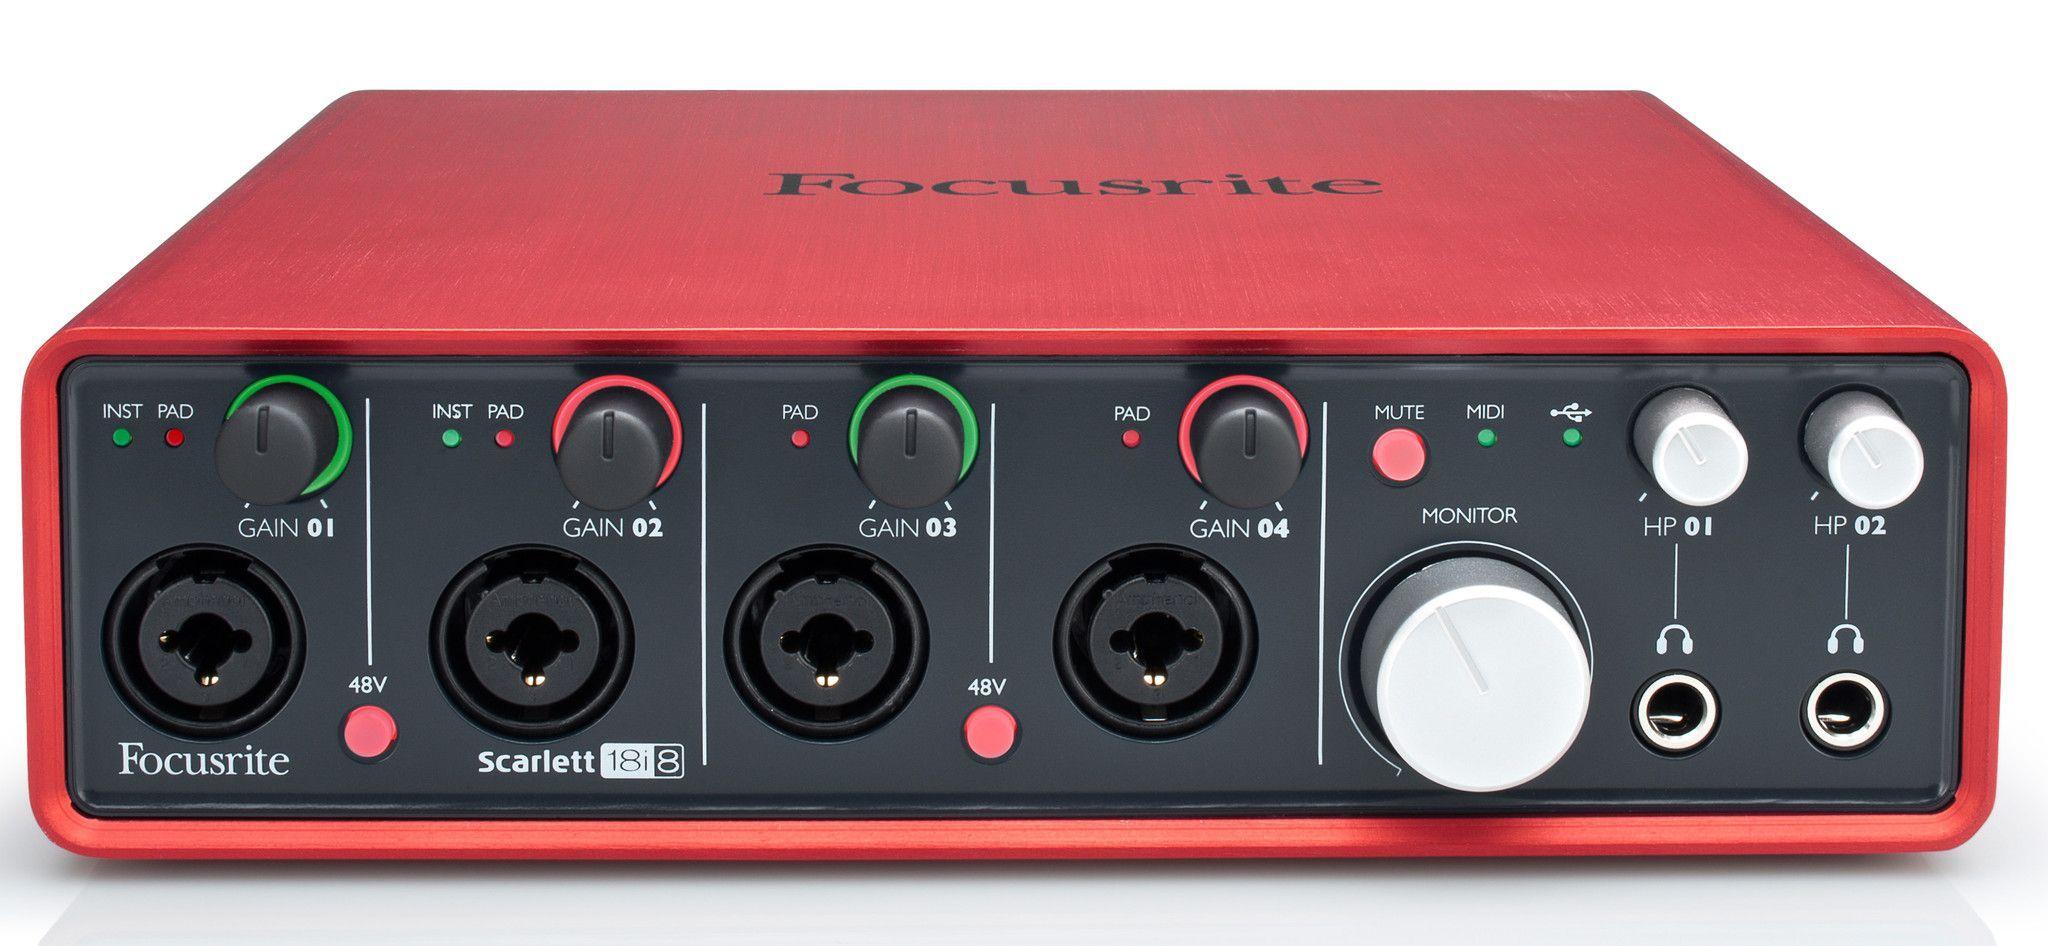 Store Demo Focusrite Scarlett 18i8 Audio Recording Interface